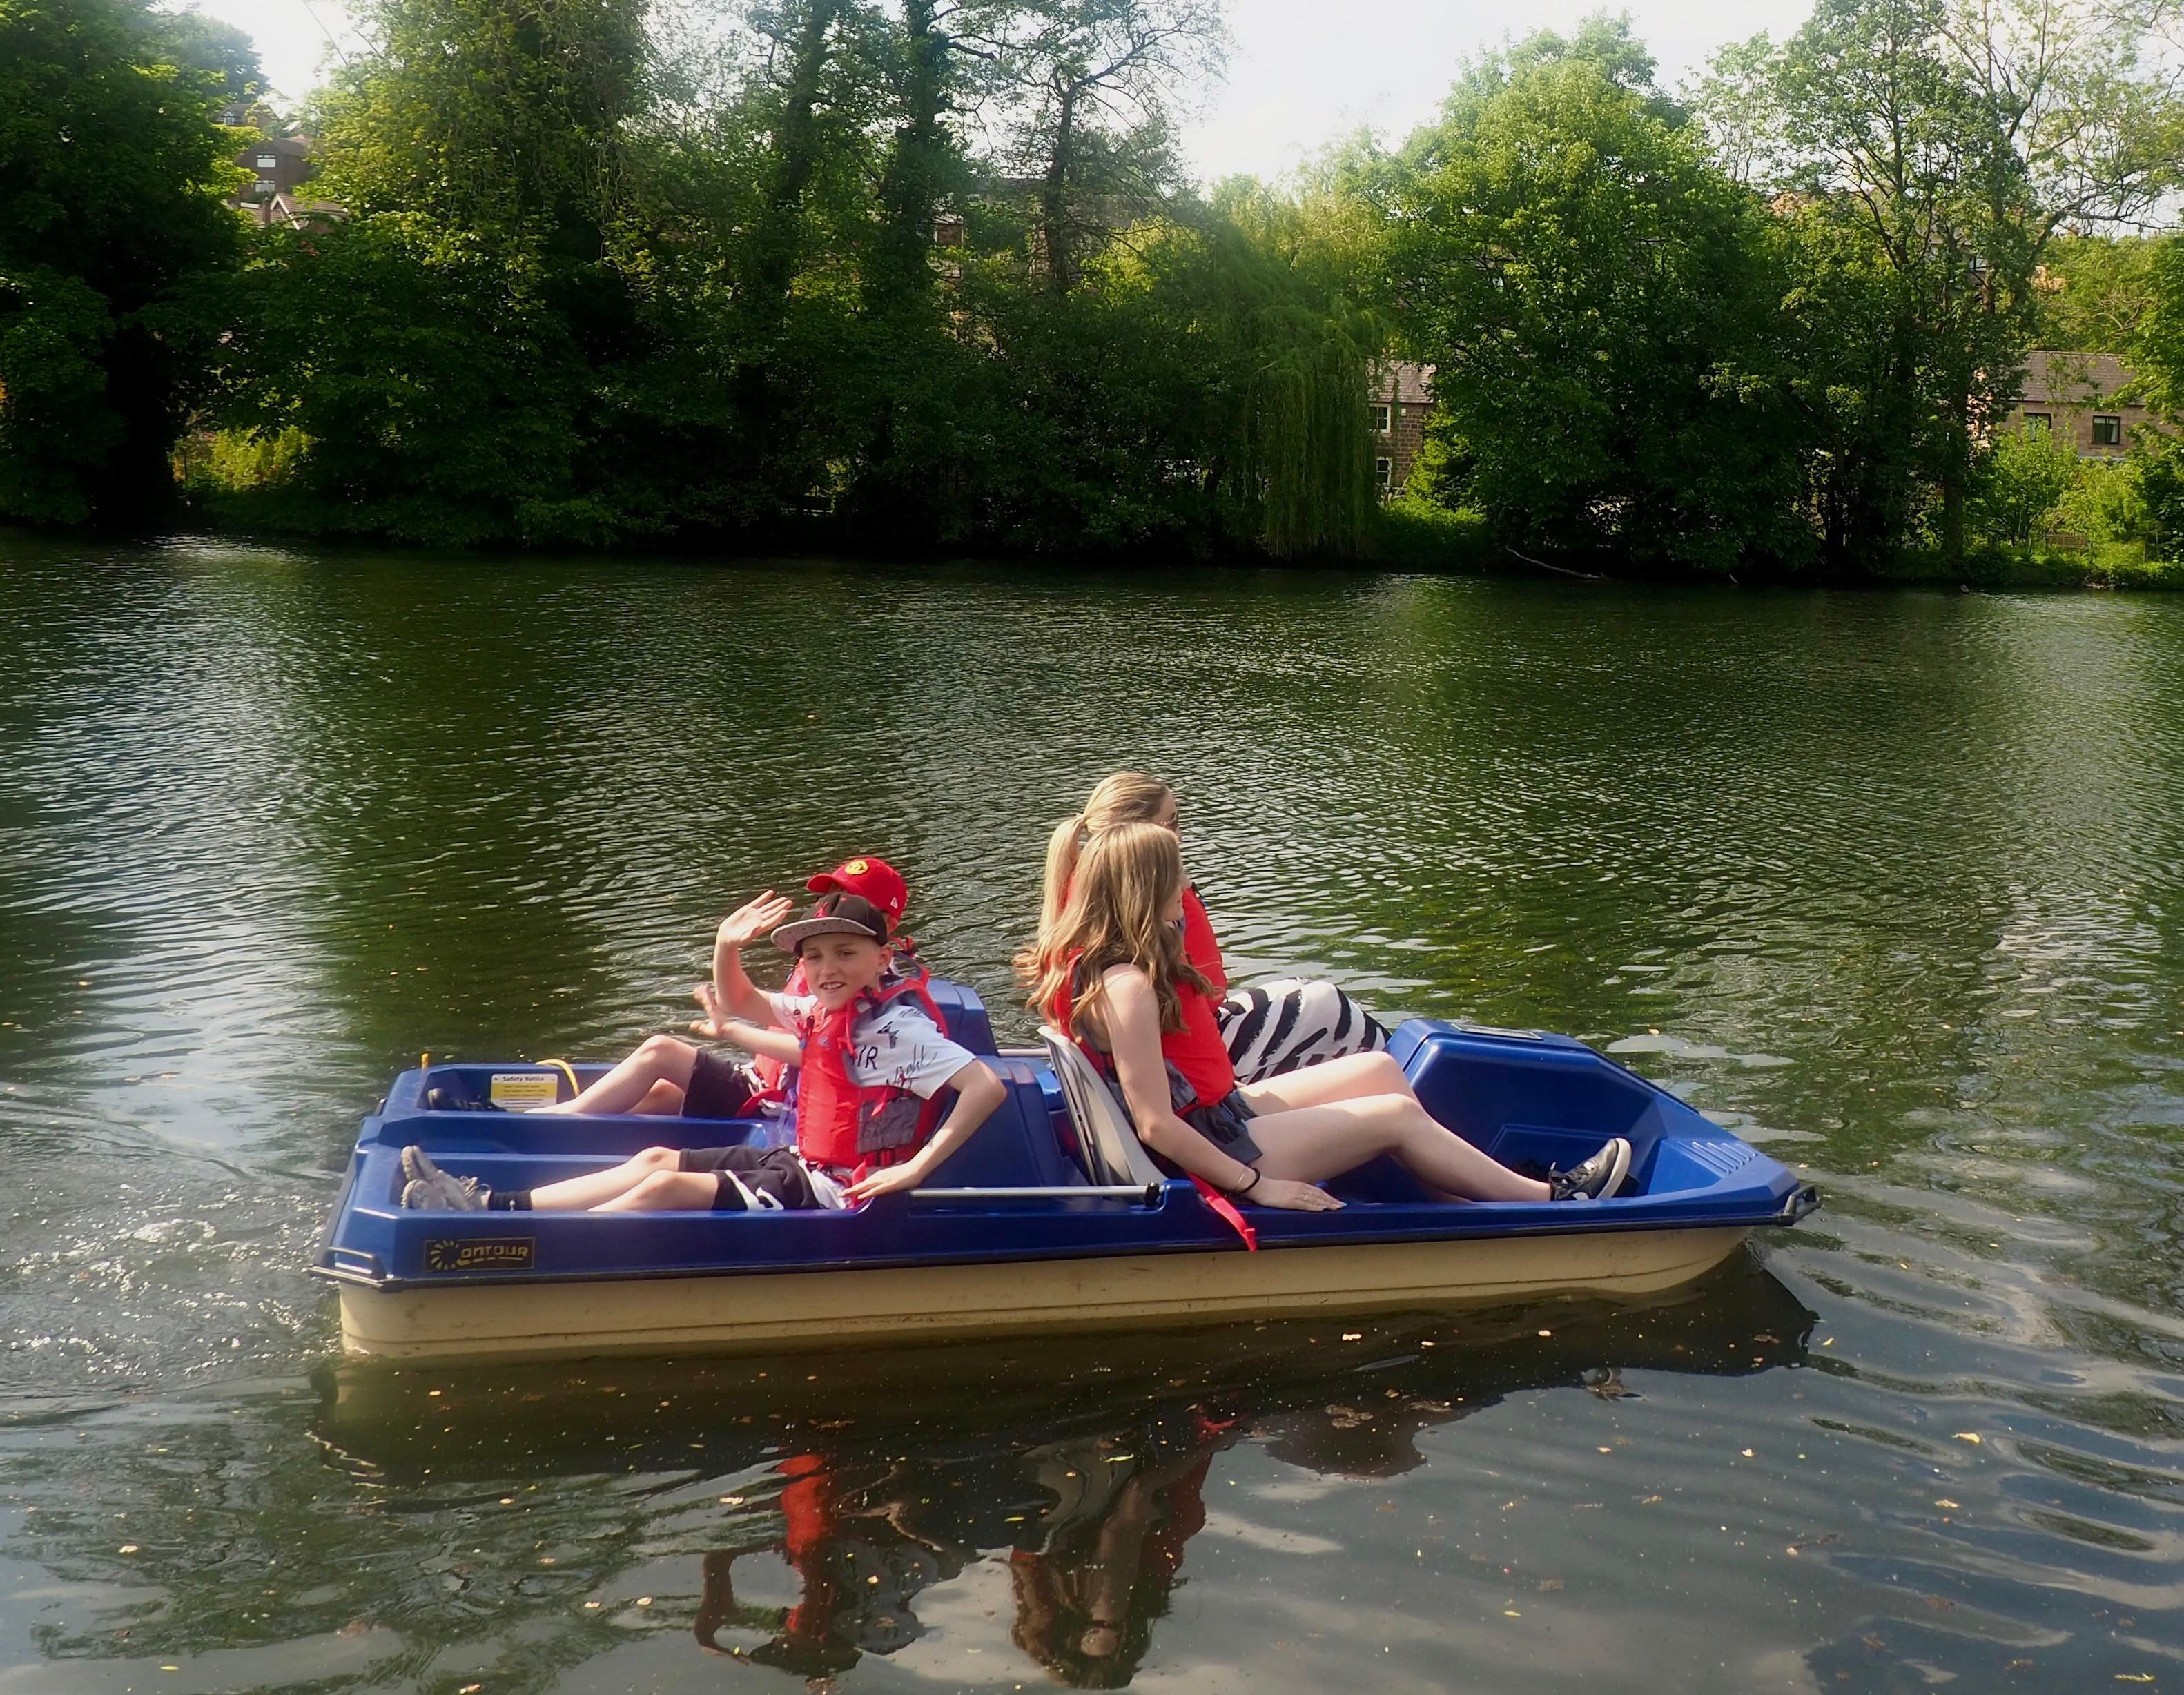 FRI-SUN: 50 Minute Hire Pedal Boat